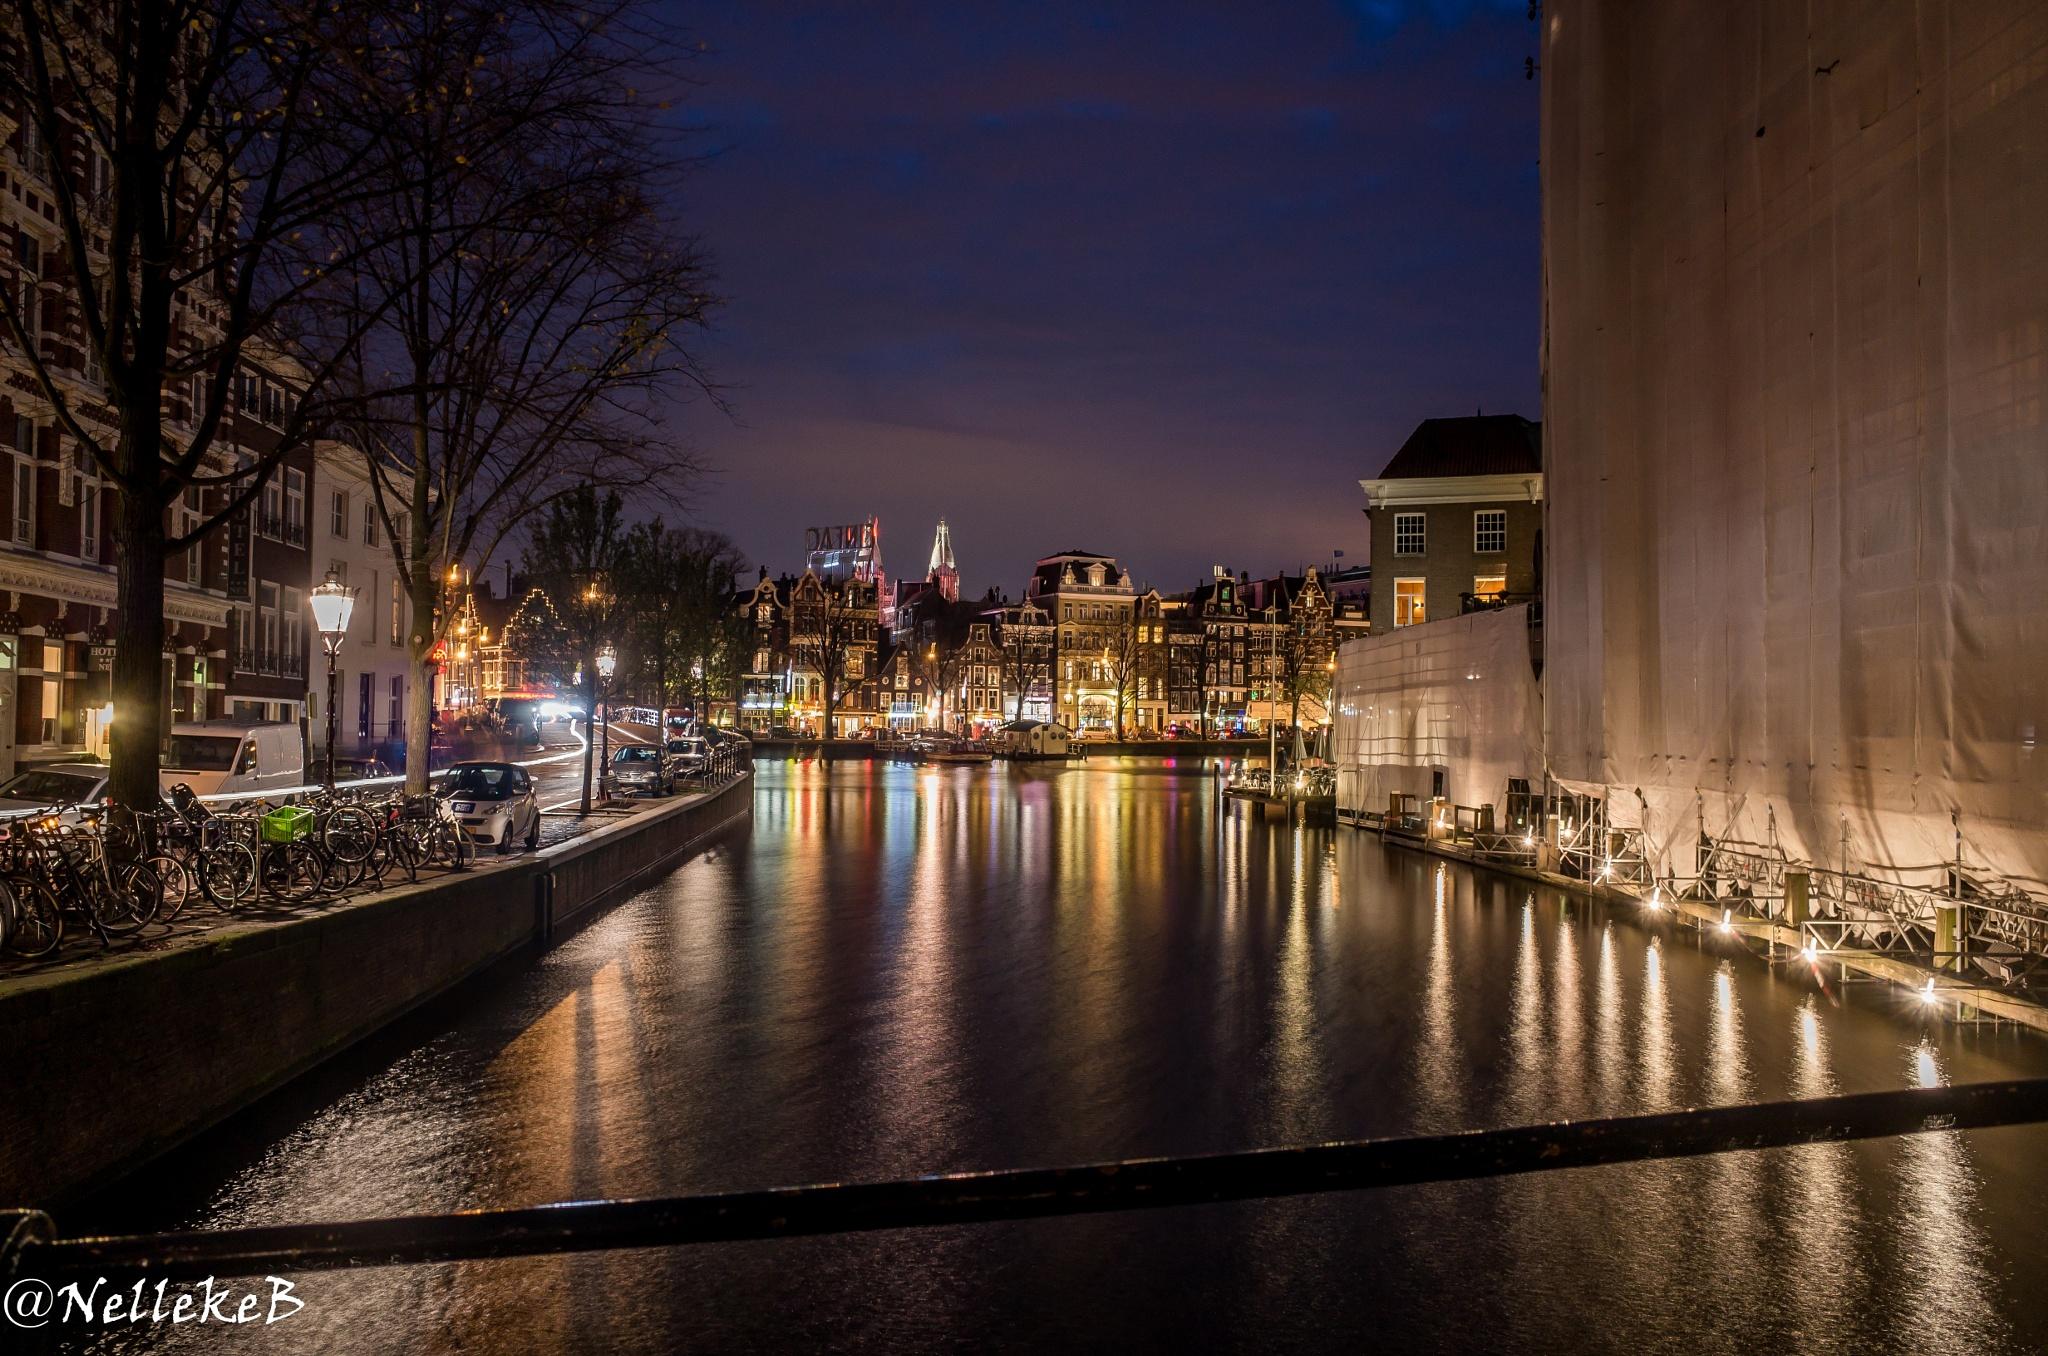 View on the Amstel by nellekebmn